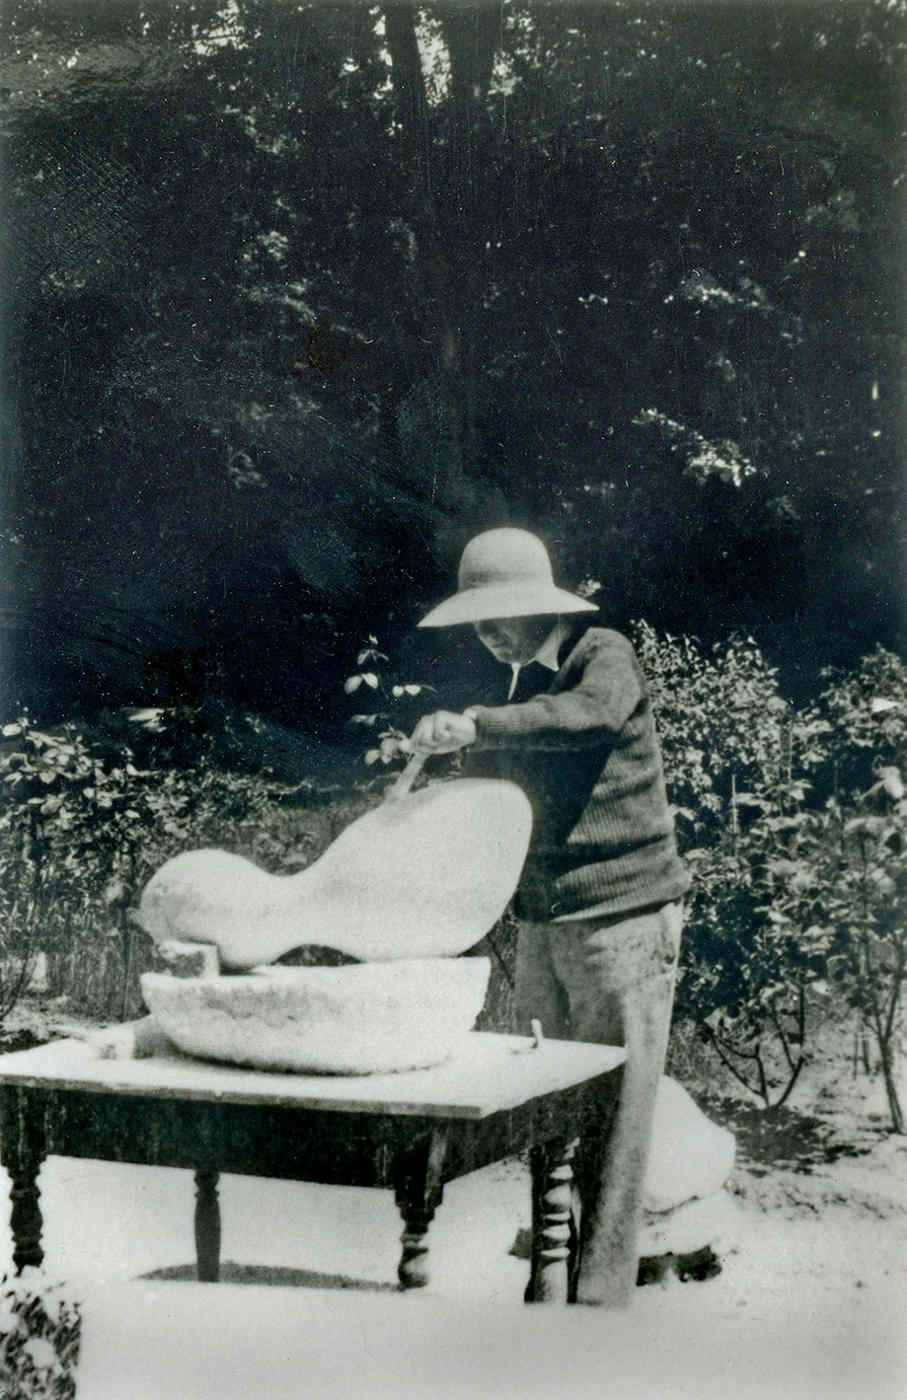 Hans Arp at work in the Clamart garden, c. 1930